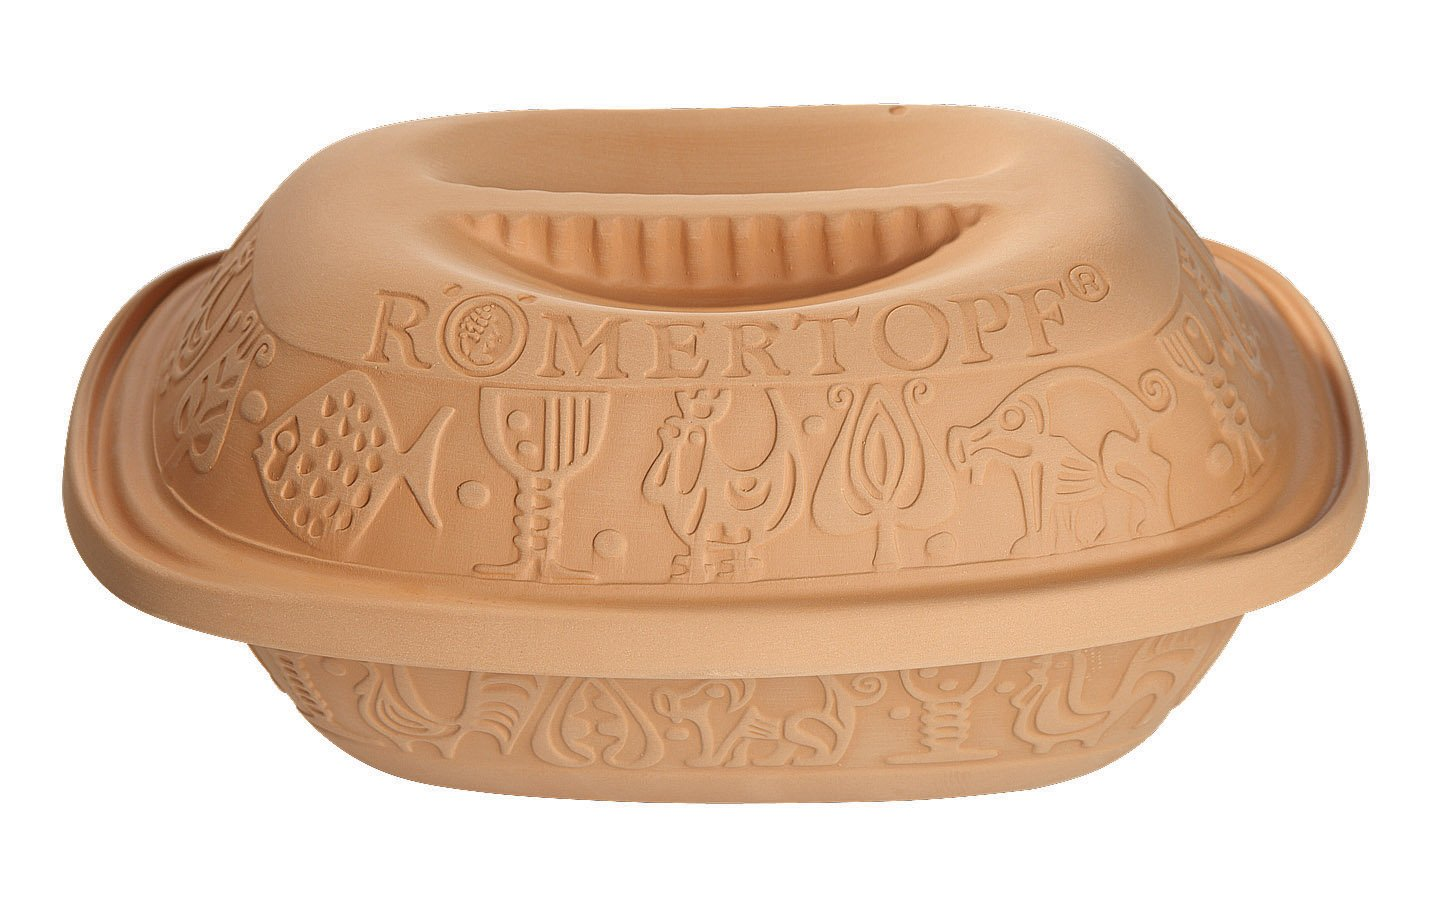 Romertopf by Reston Lloyd Classic Series Glazed Natural Clay Cooker, Medium by Rmertopf Germany